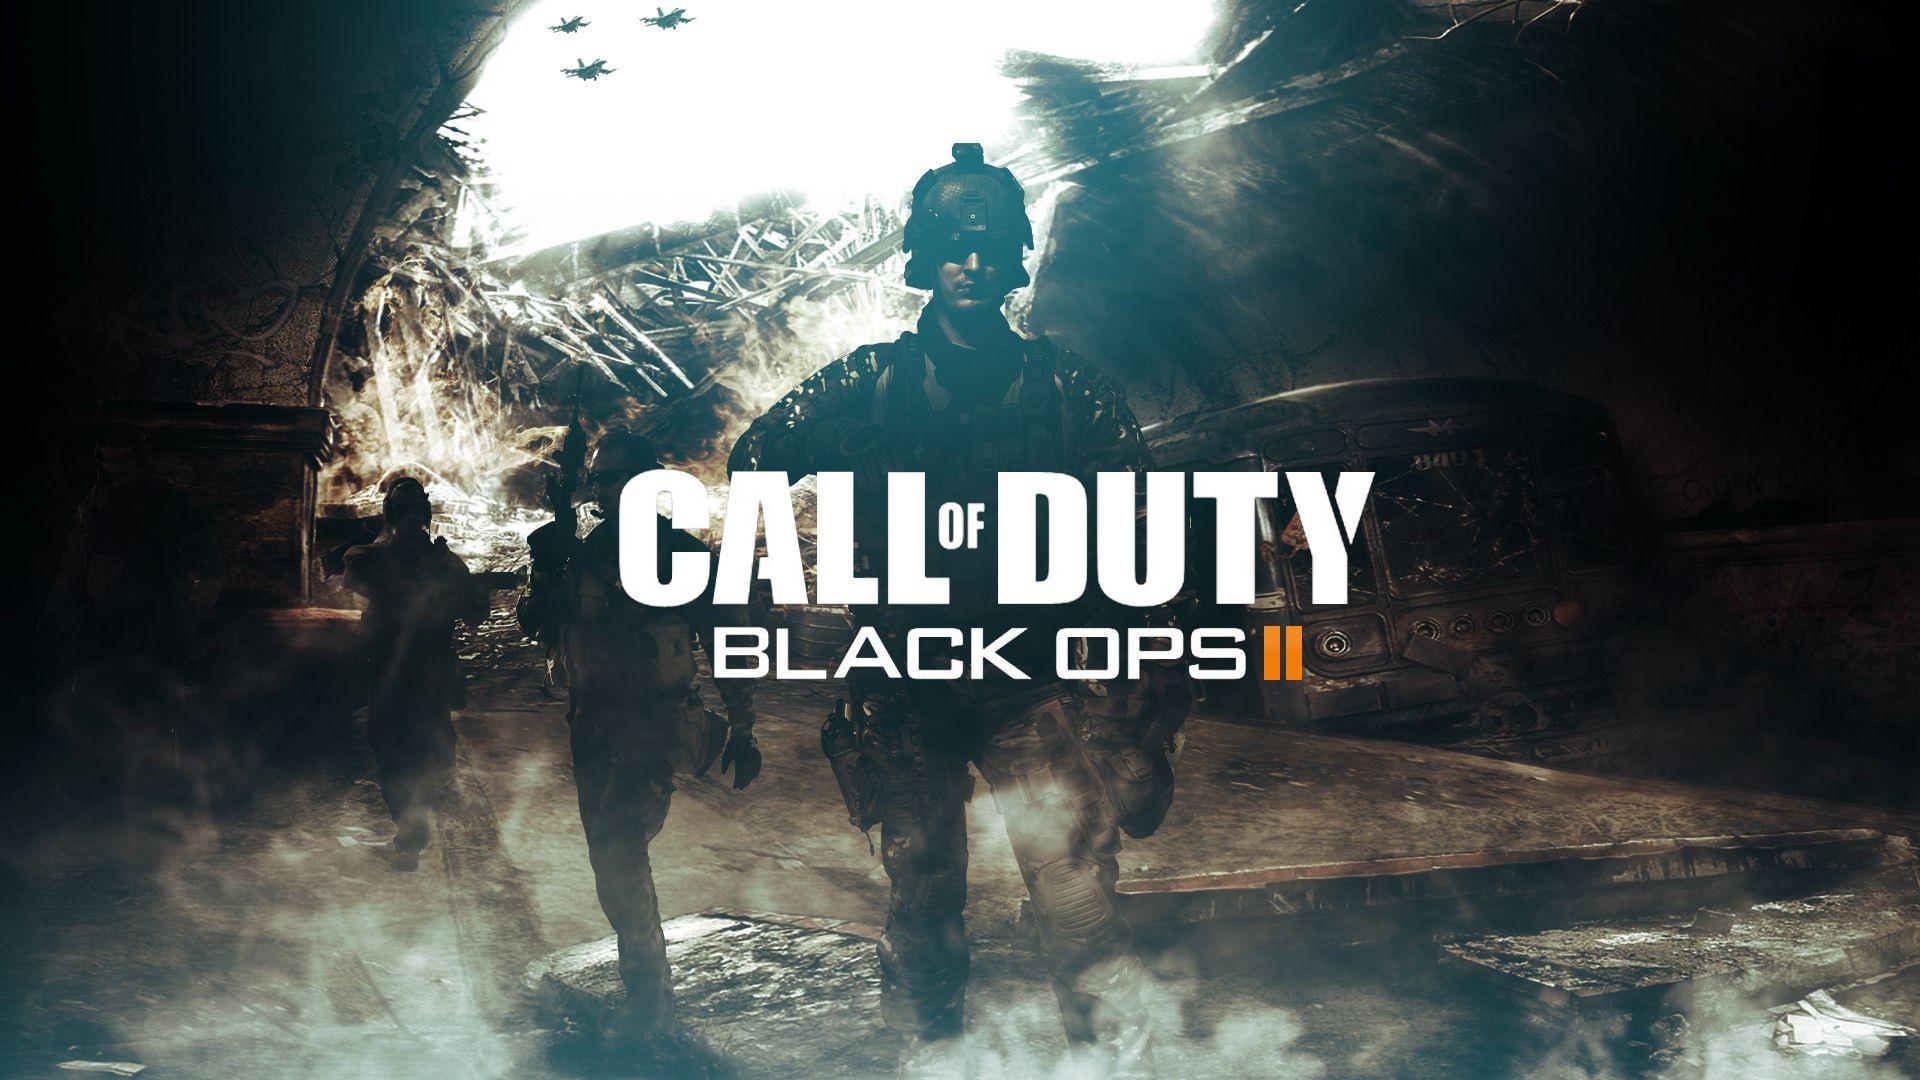 Call Of Duty: Black Ops 2 HD Wallpaper #10